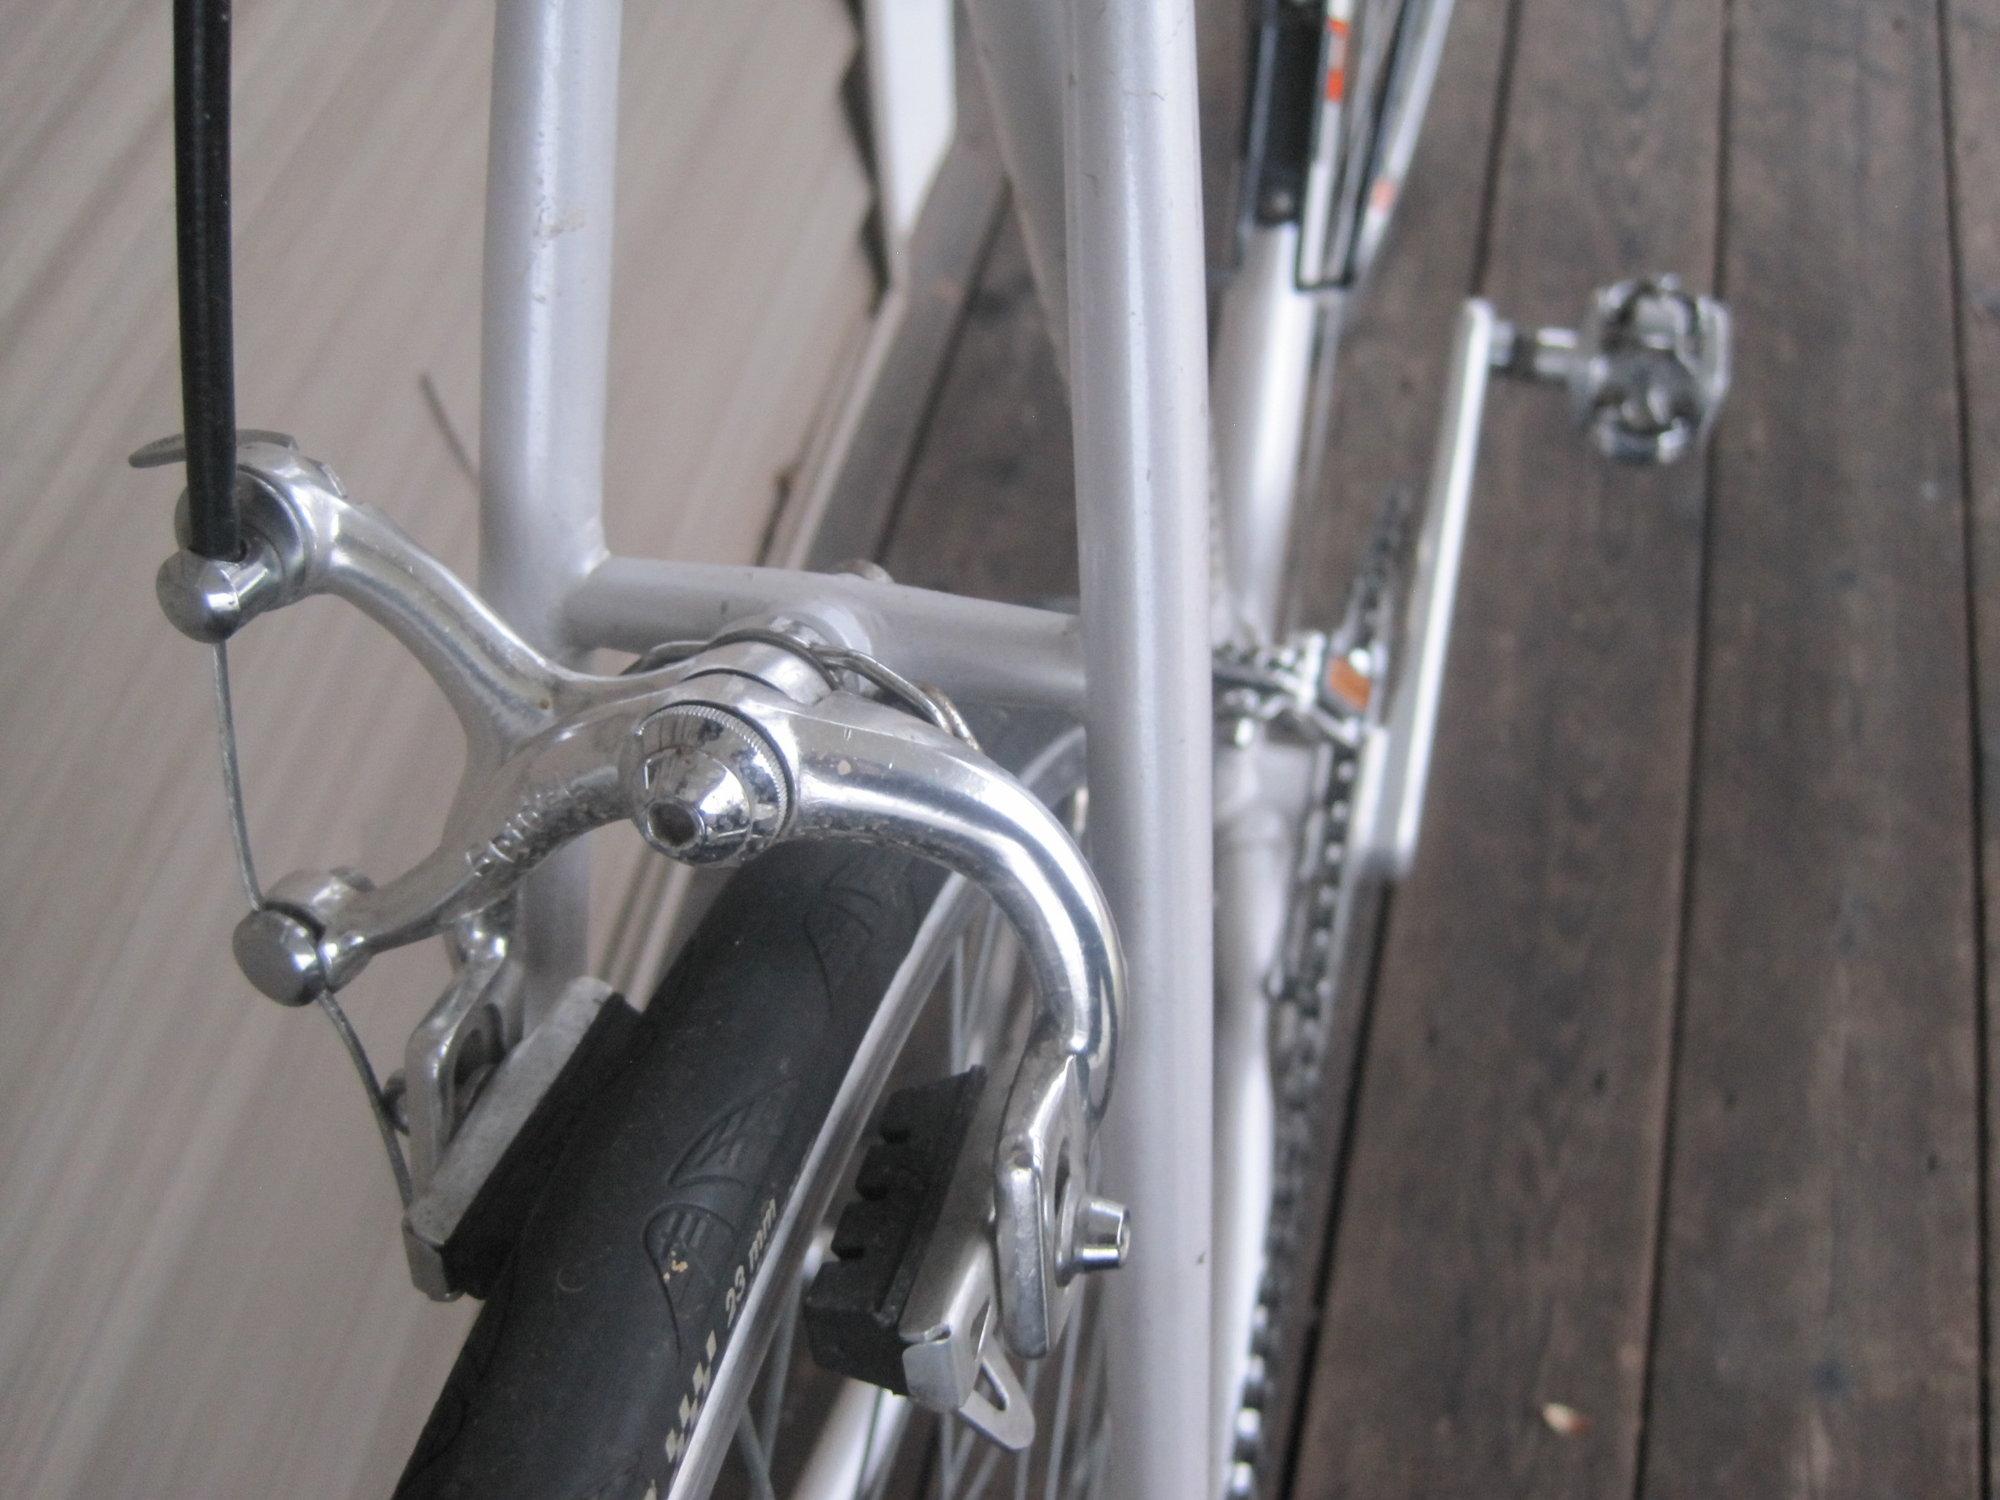 1981 Peugeot PXN 10 Super Competition 57 cm - Bike Forums